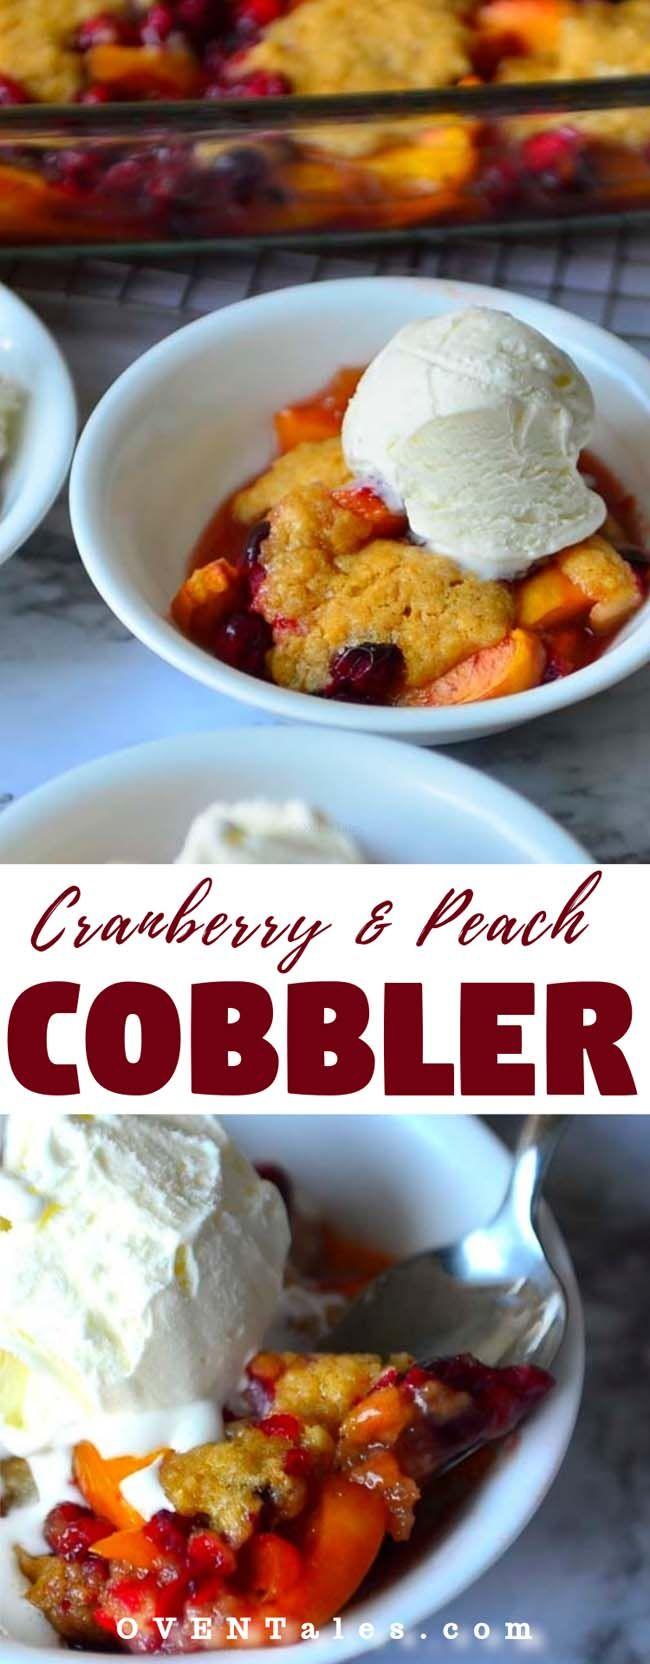 Cranberry and Peach Cobbler #peachcobblercheesecake